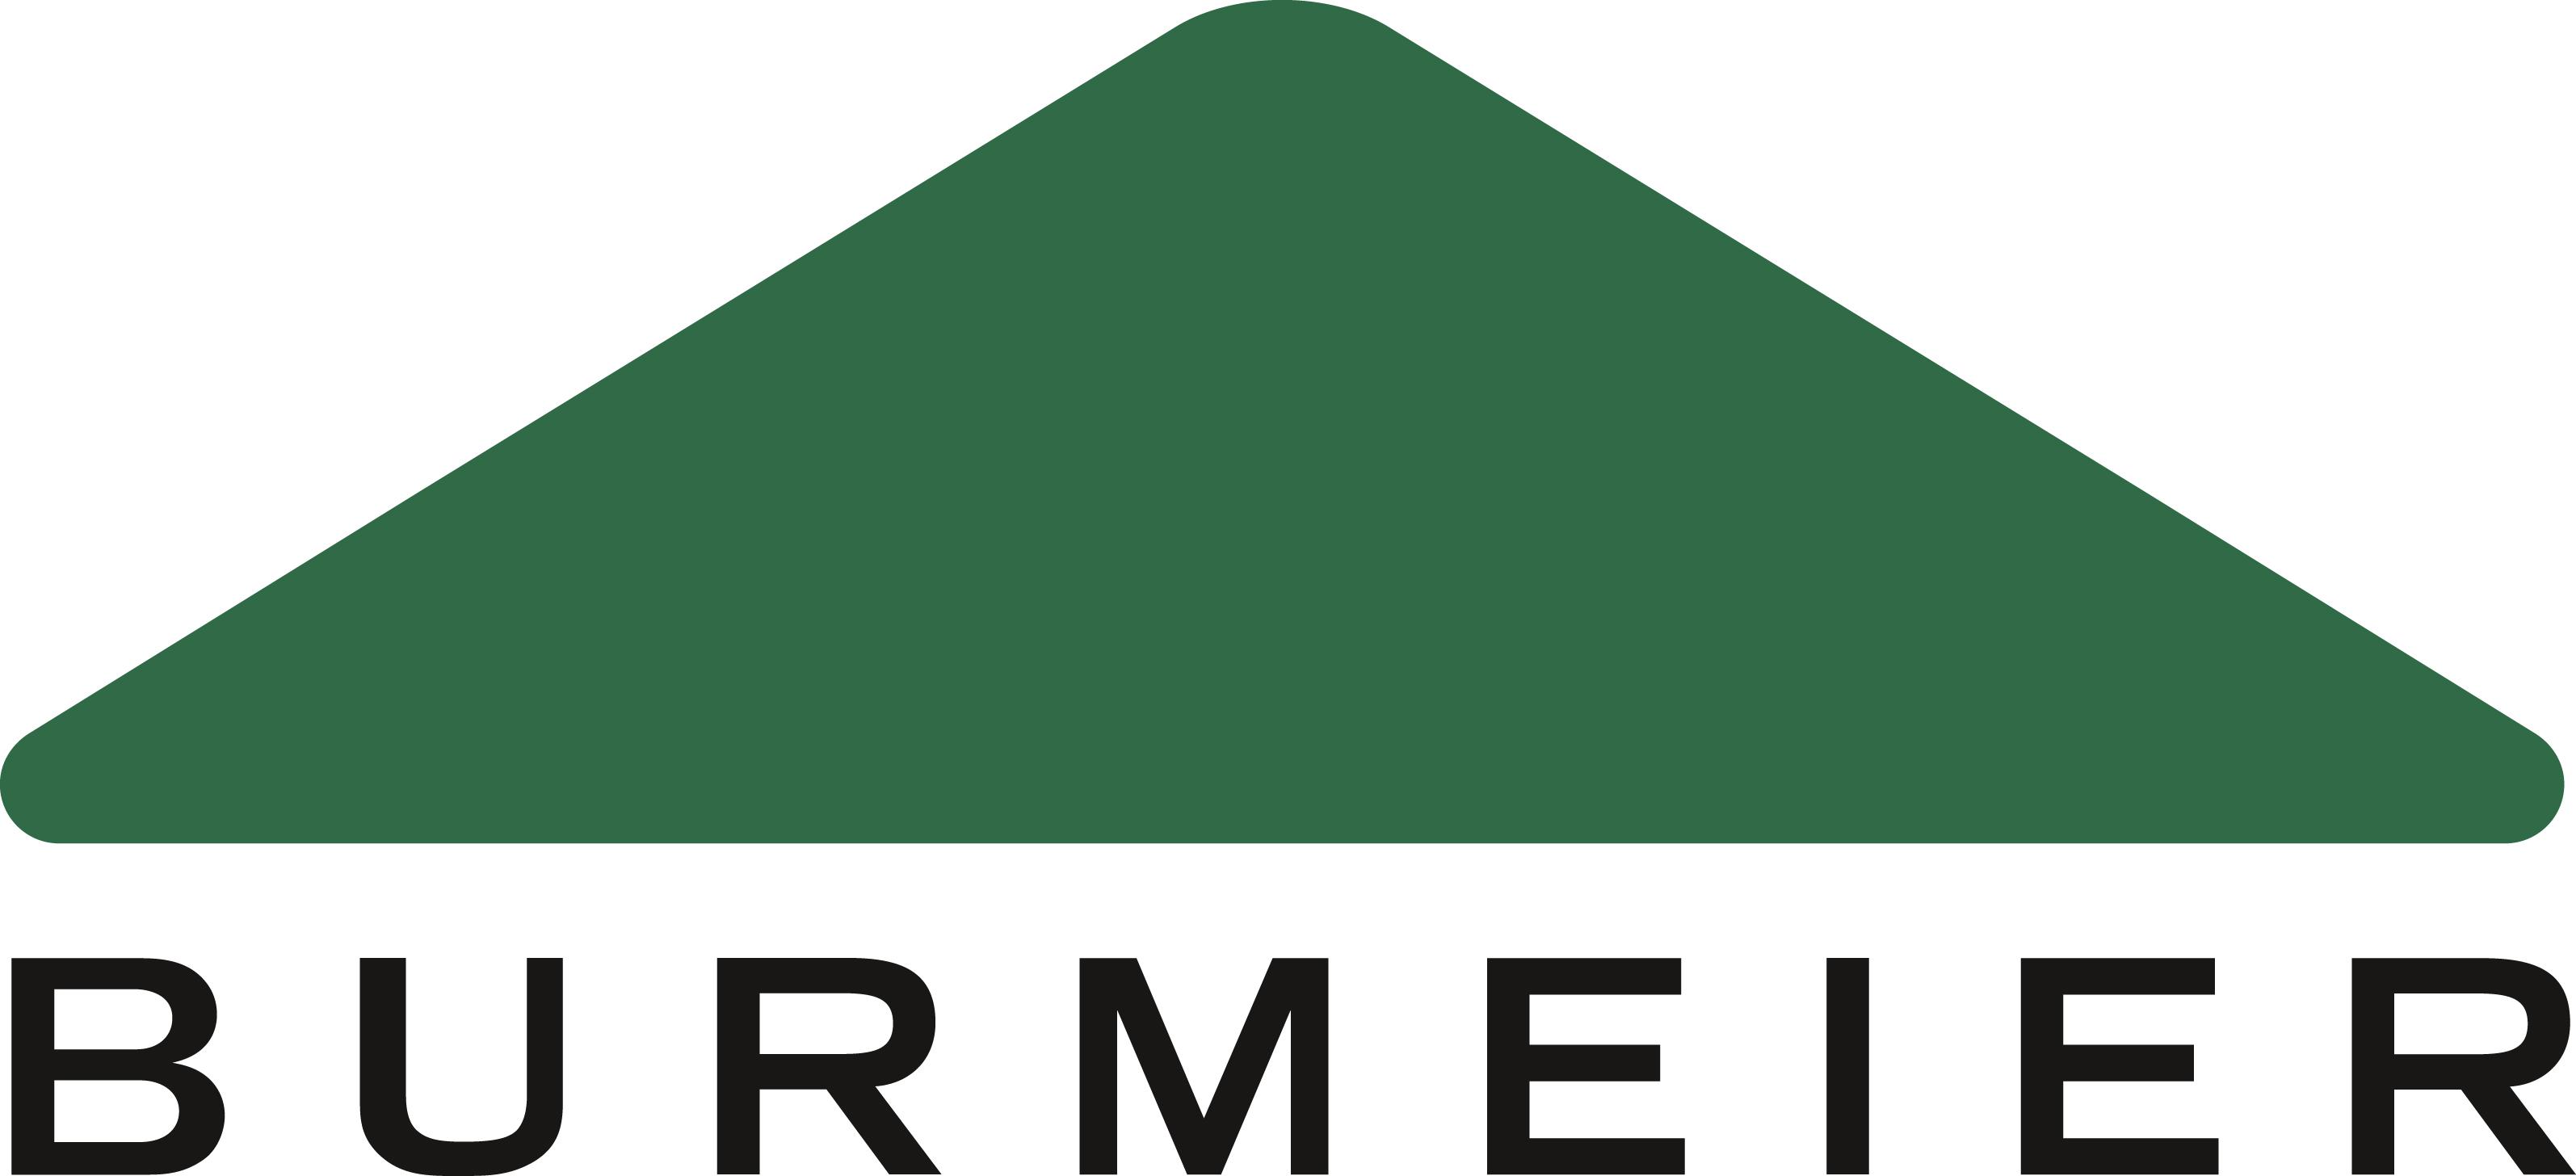 Burmeier GmbH & Co.KG